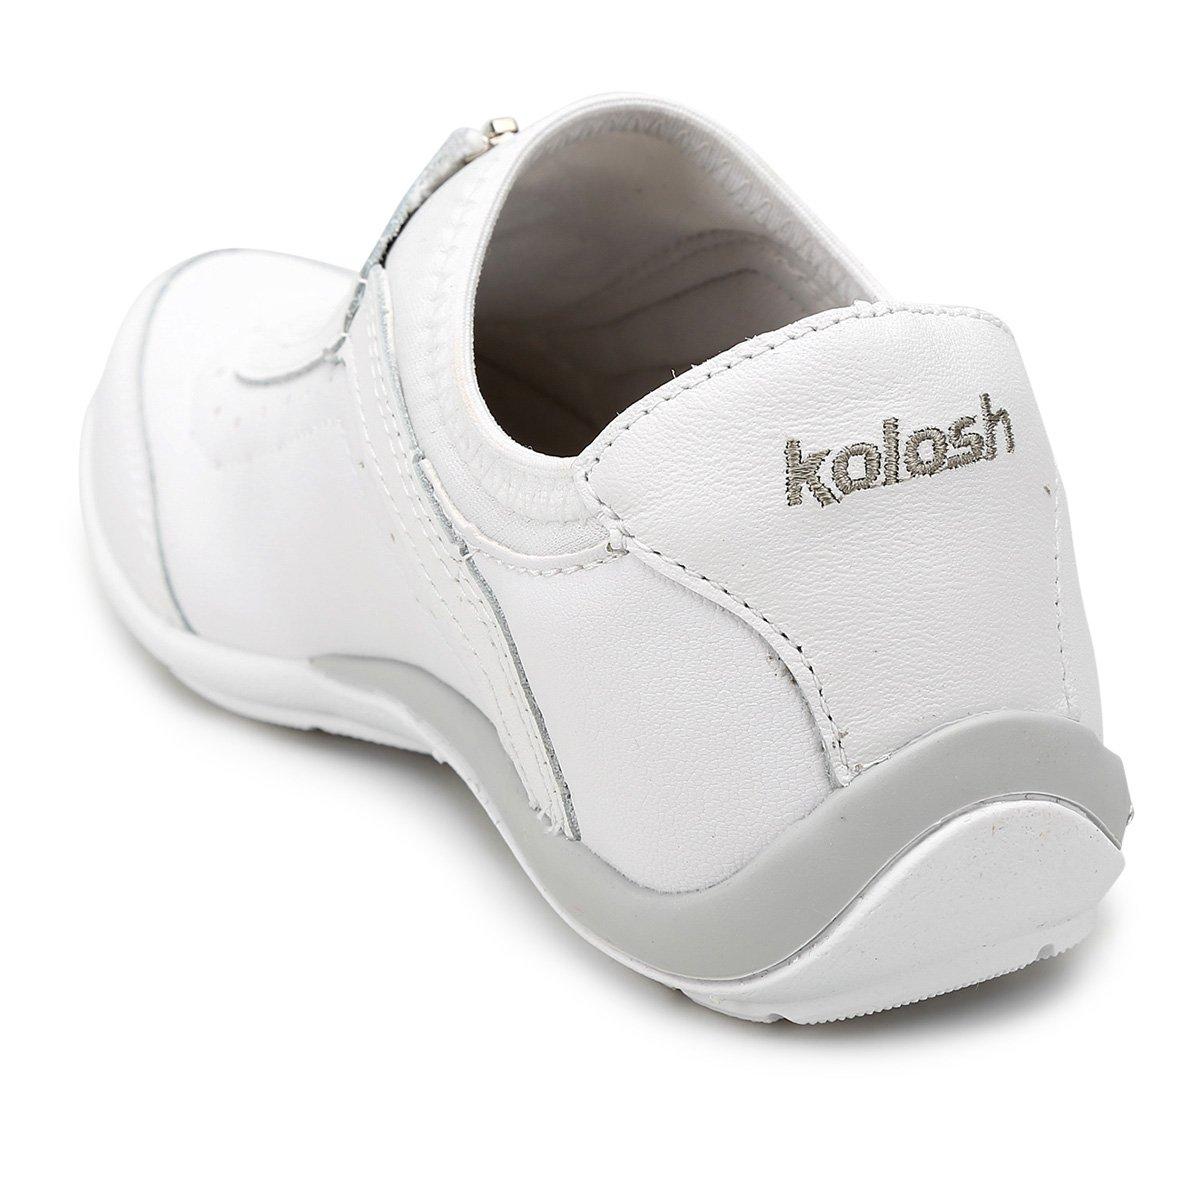 Kolosh Couro Zíper Branco Couro Frontal Zíper Tênis Tênis Feminina Kolosh rrEwxa